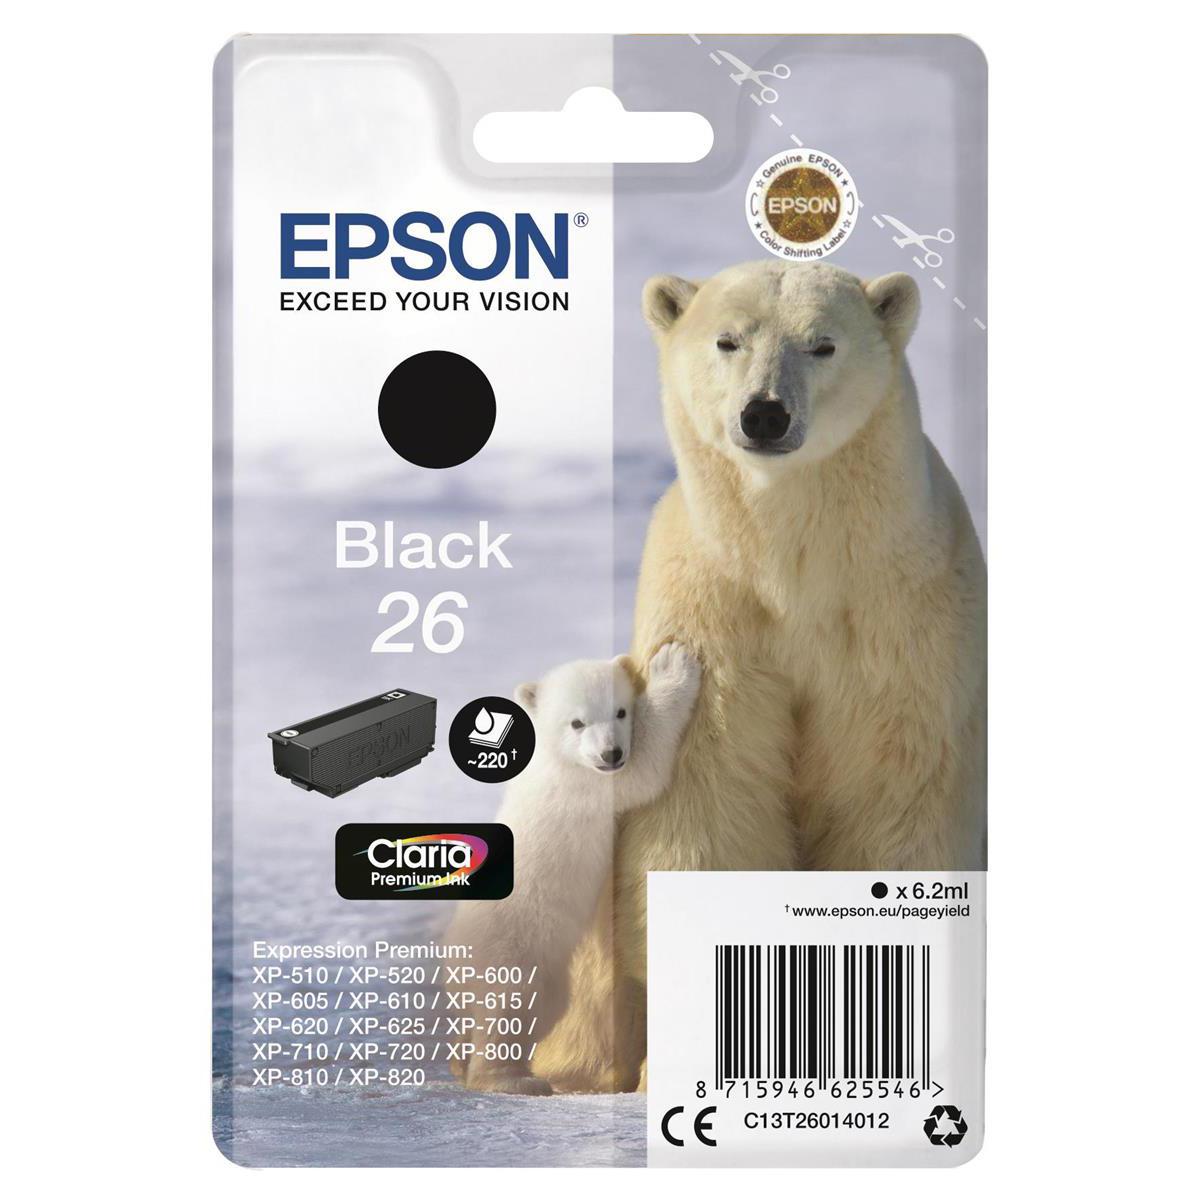 Epson 26 Inkjet Cartridge Polar Bear Page Life 220pp 6.2ml Black Ref C13T26014012